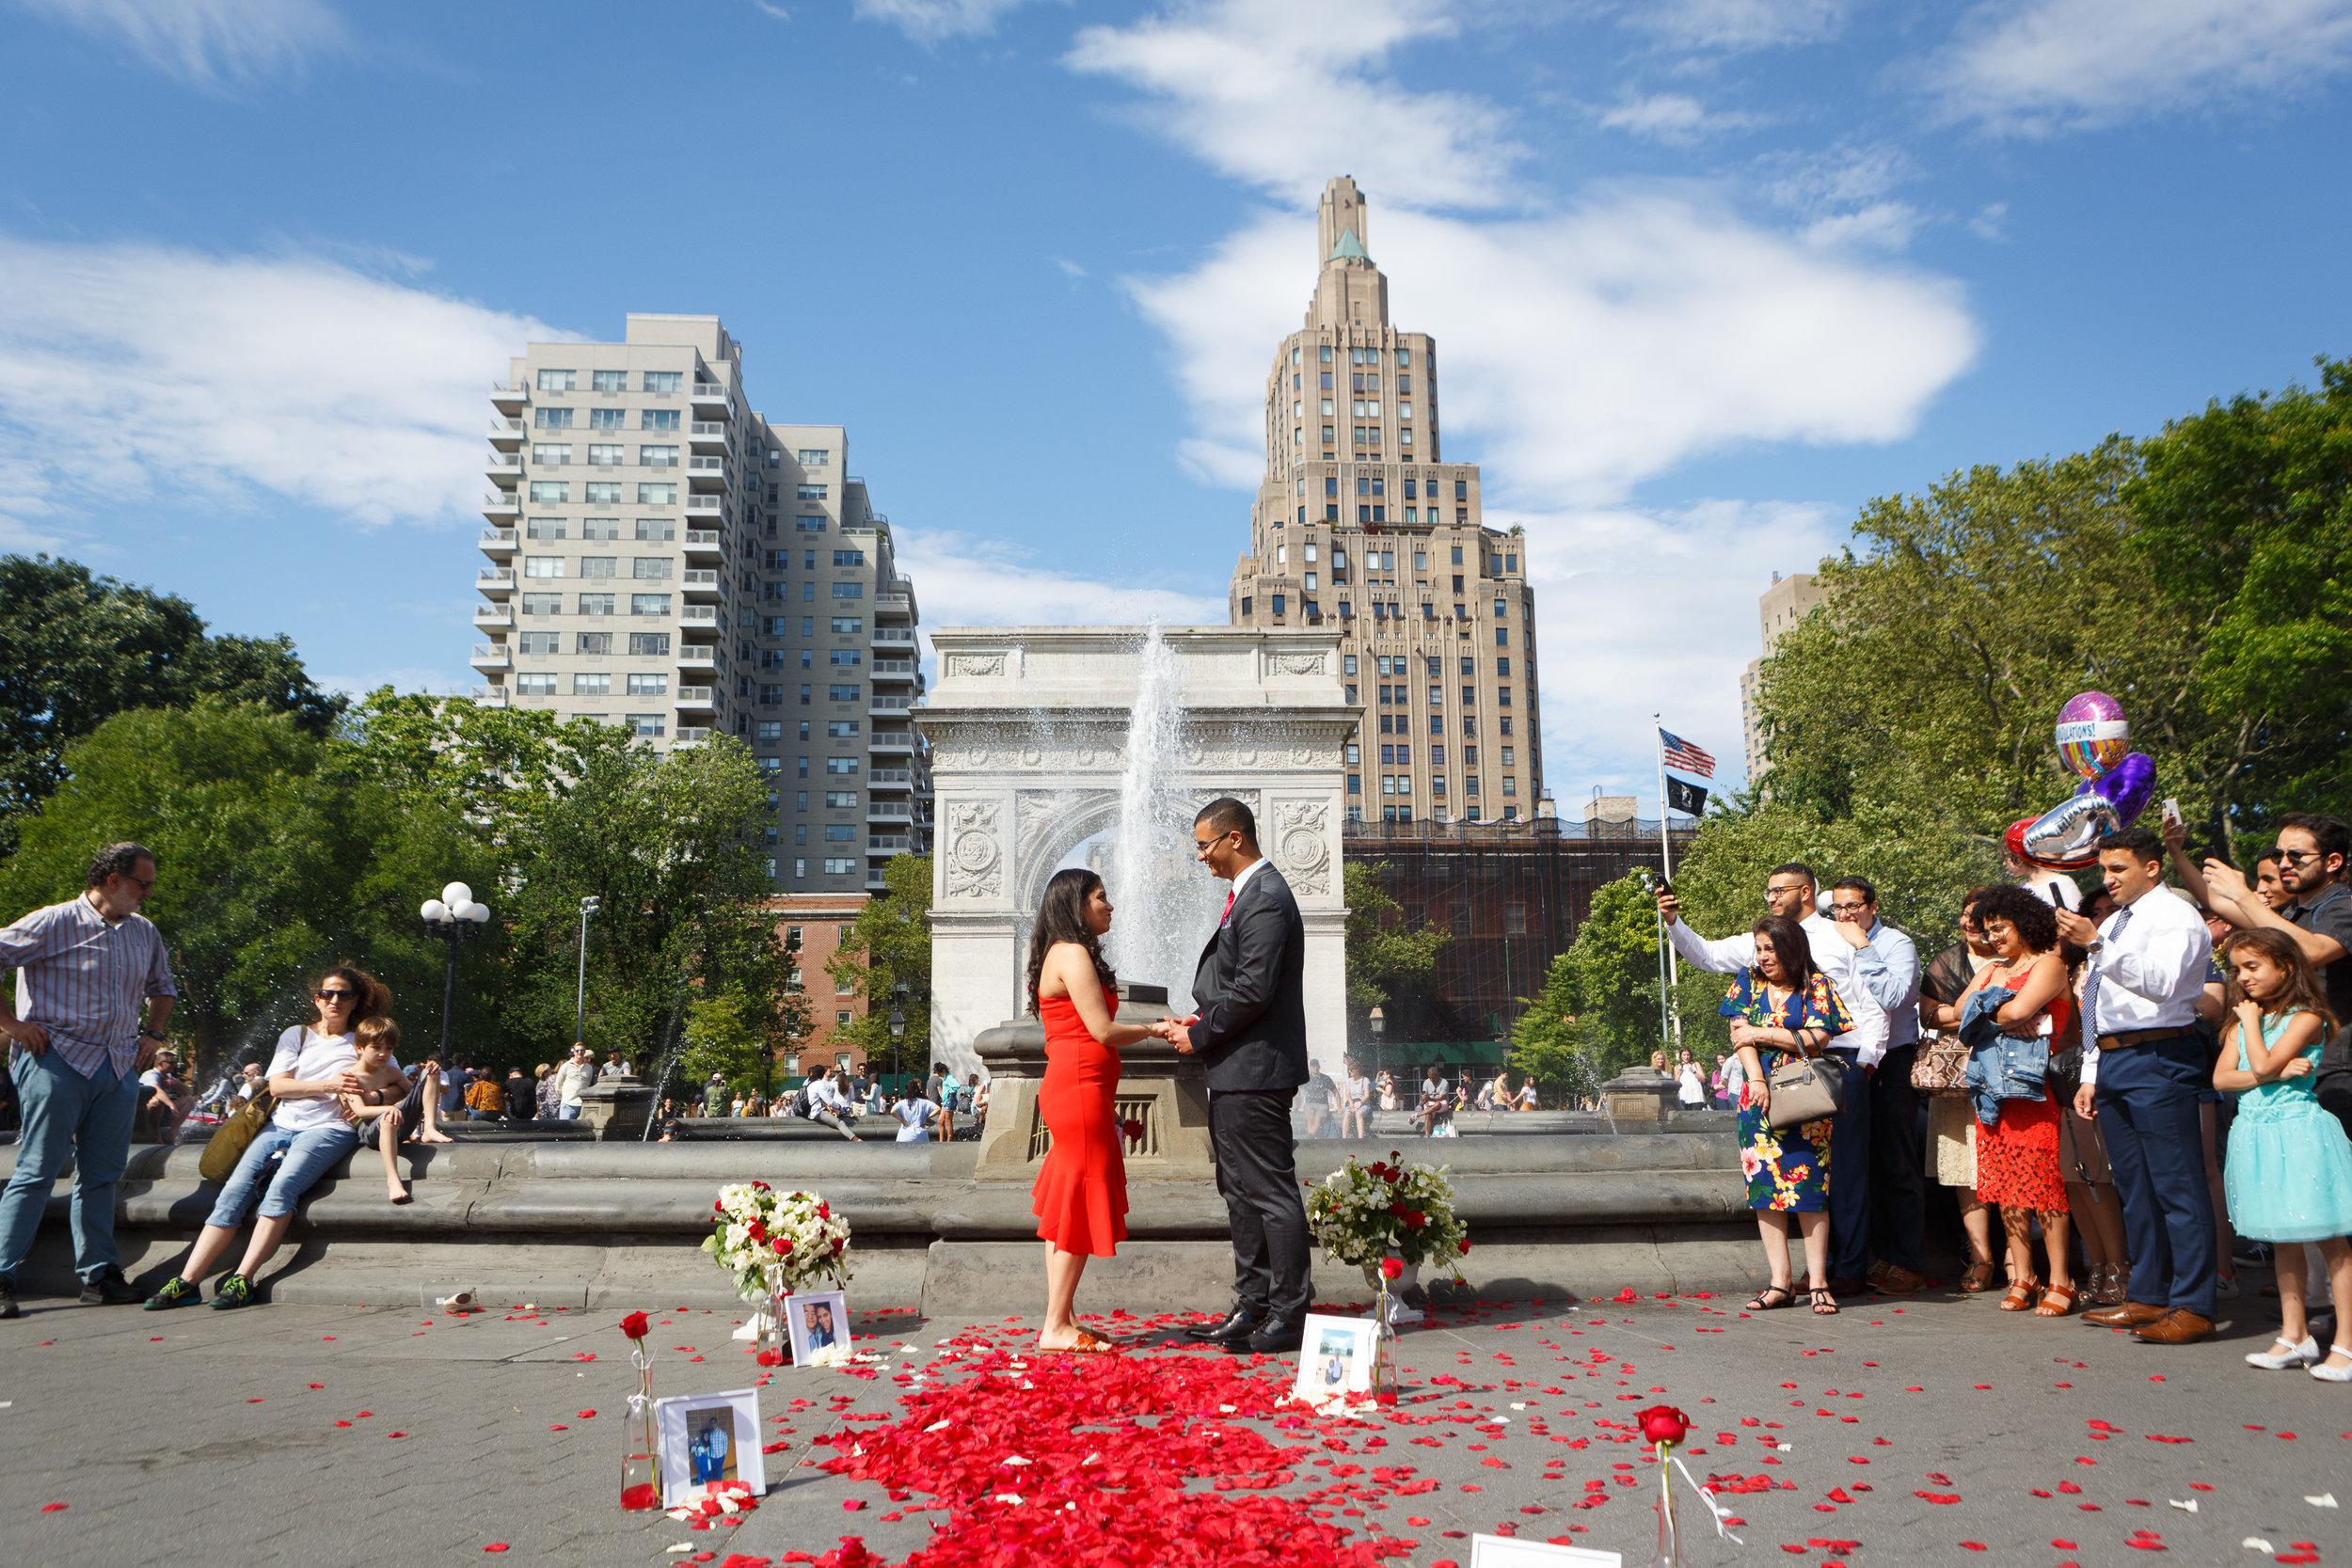 Kiro Rebecca Washington Square Park Marriage Proposal _ Jonathan Heisler _ 6152019 _019.jpg